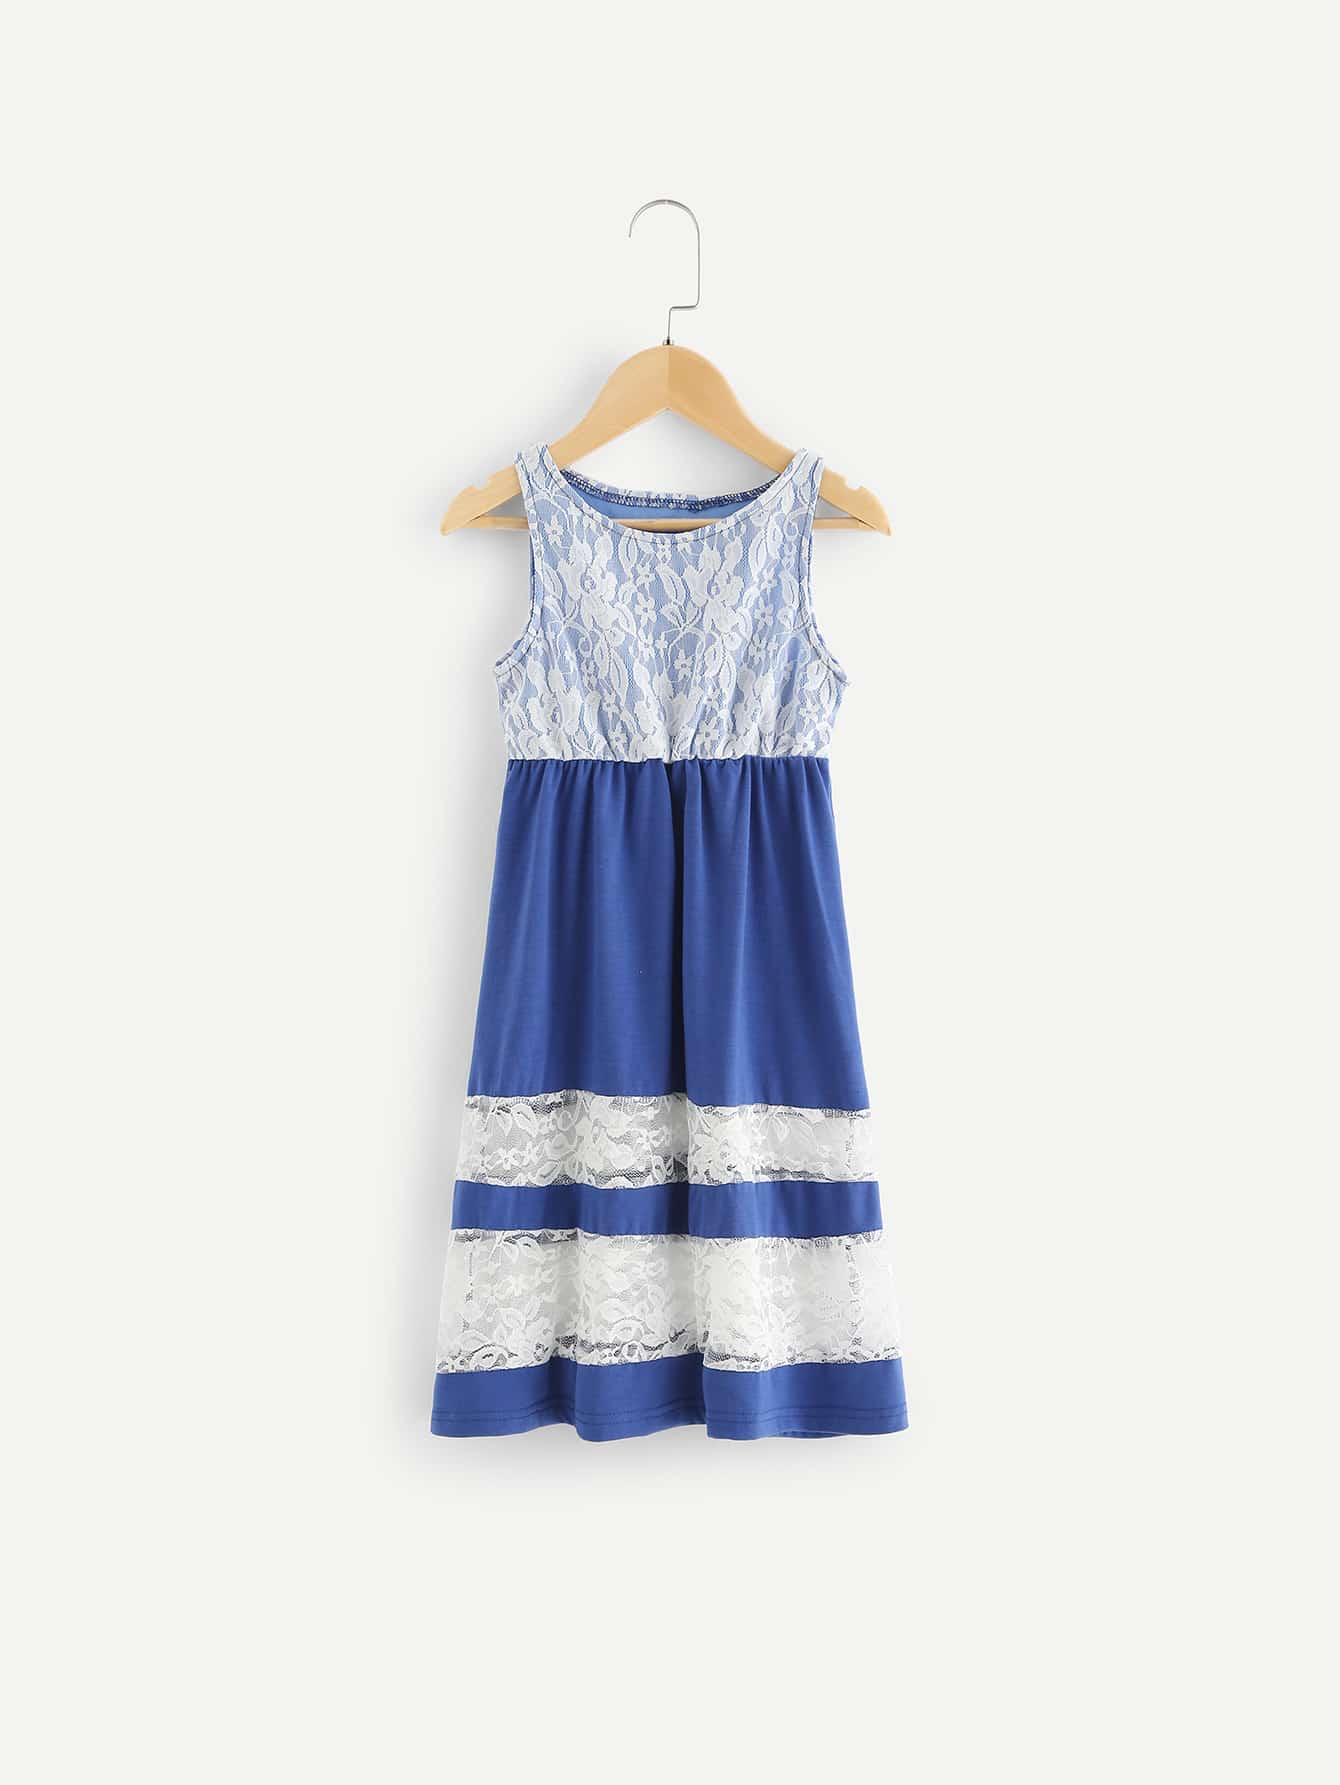 Girls Contrast Lace Dress кейс fortuna forward 1pc черный w11801 3